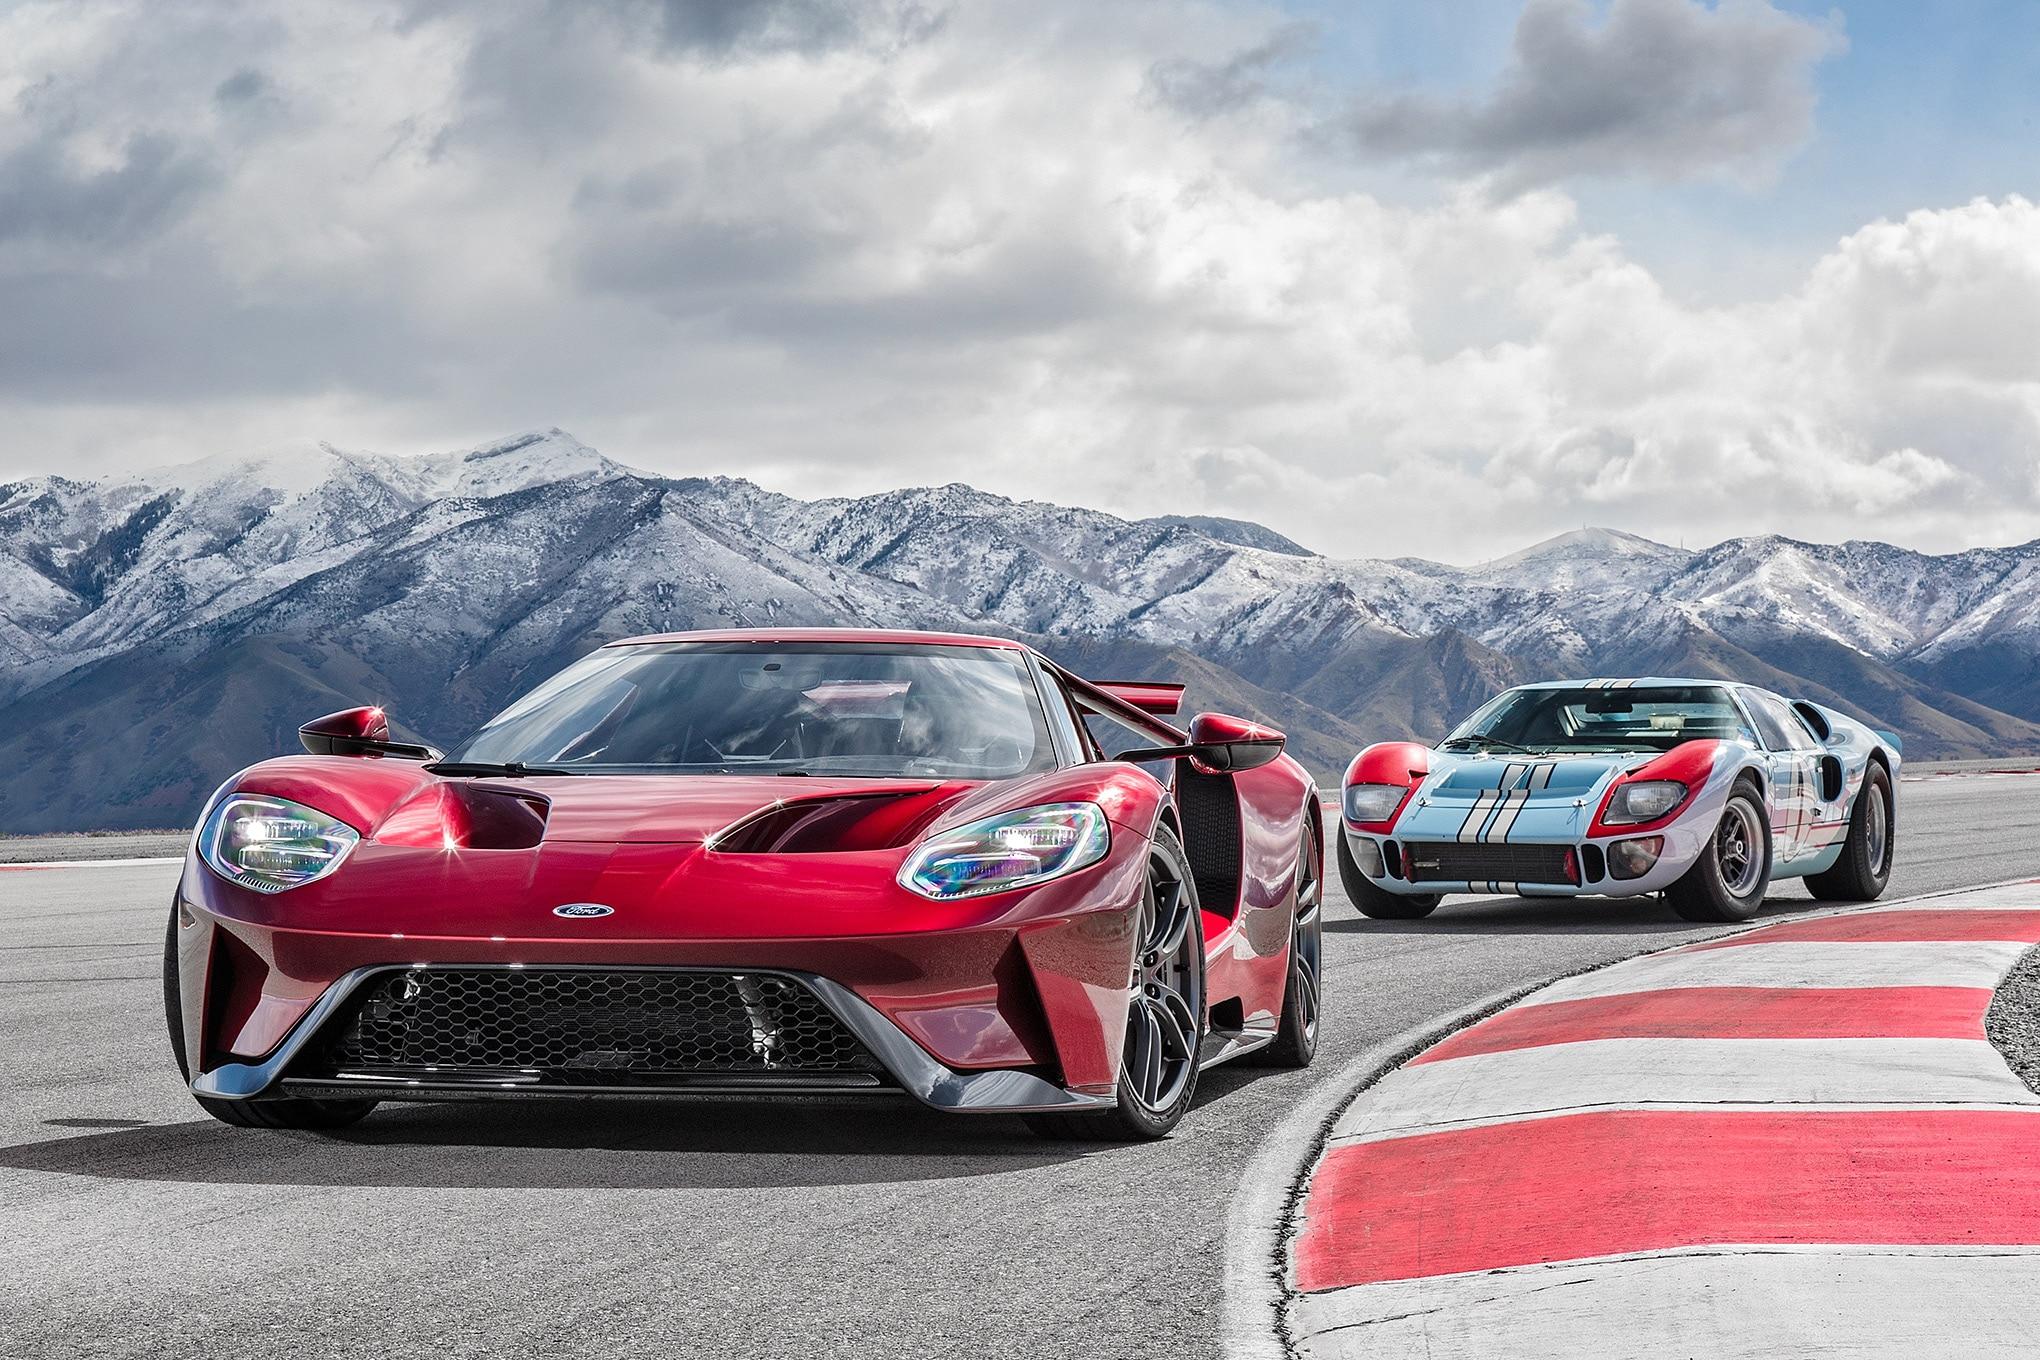 Lamborghini Price 2017 >> 2017 Ford GT First Drive Review | Automobile Magazine